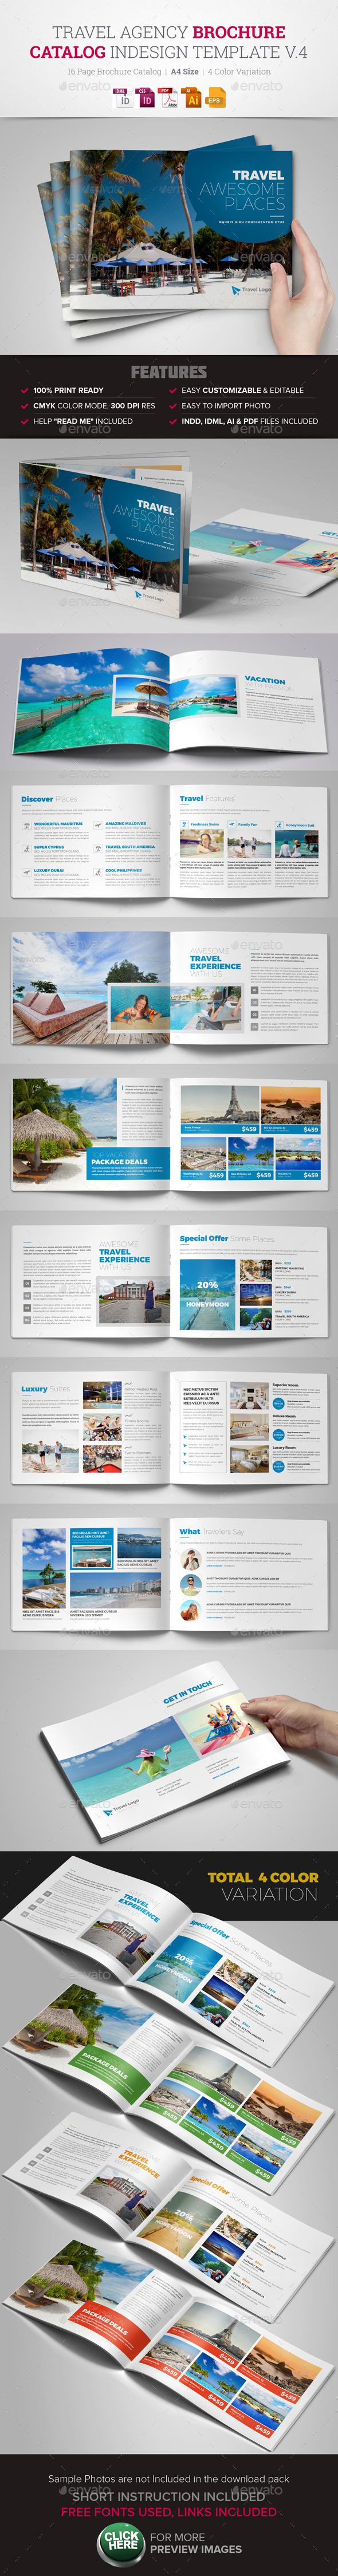 Travel Agency Brochure Catalog v4 - Corporate Brochures